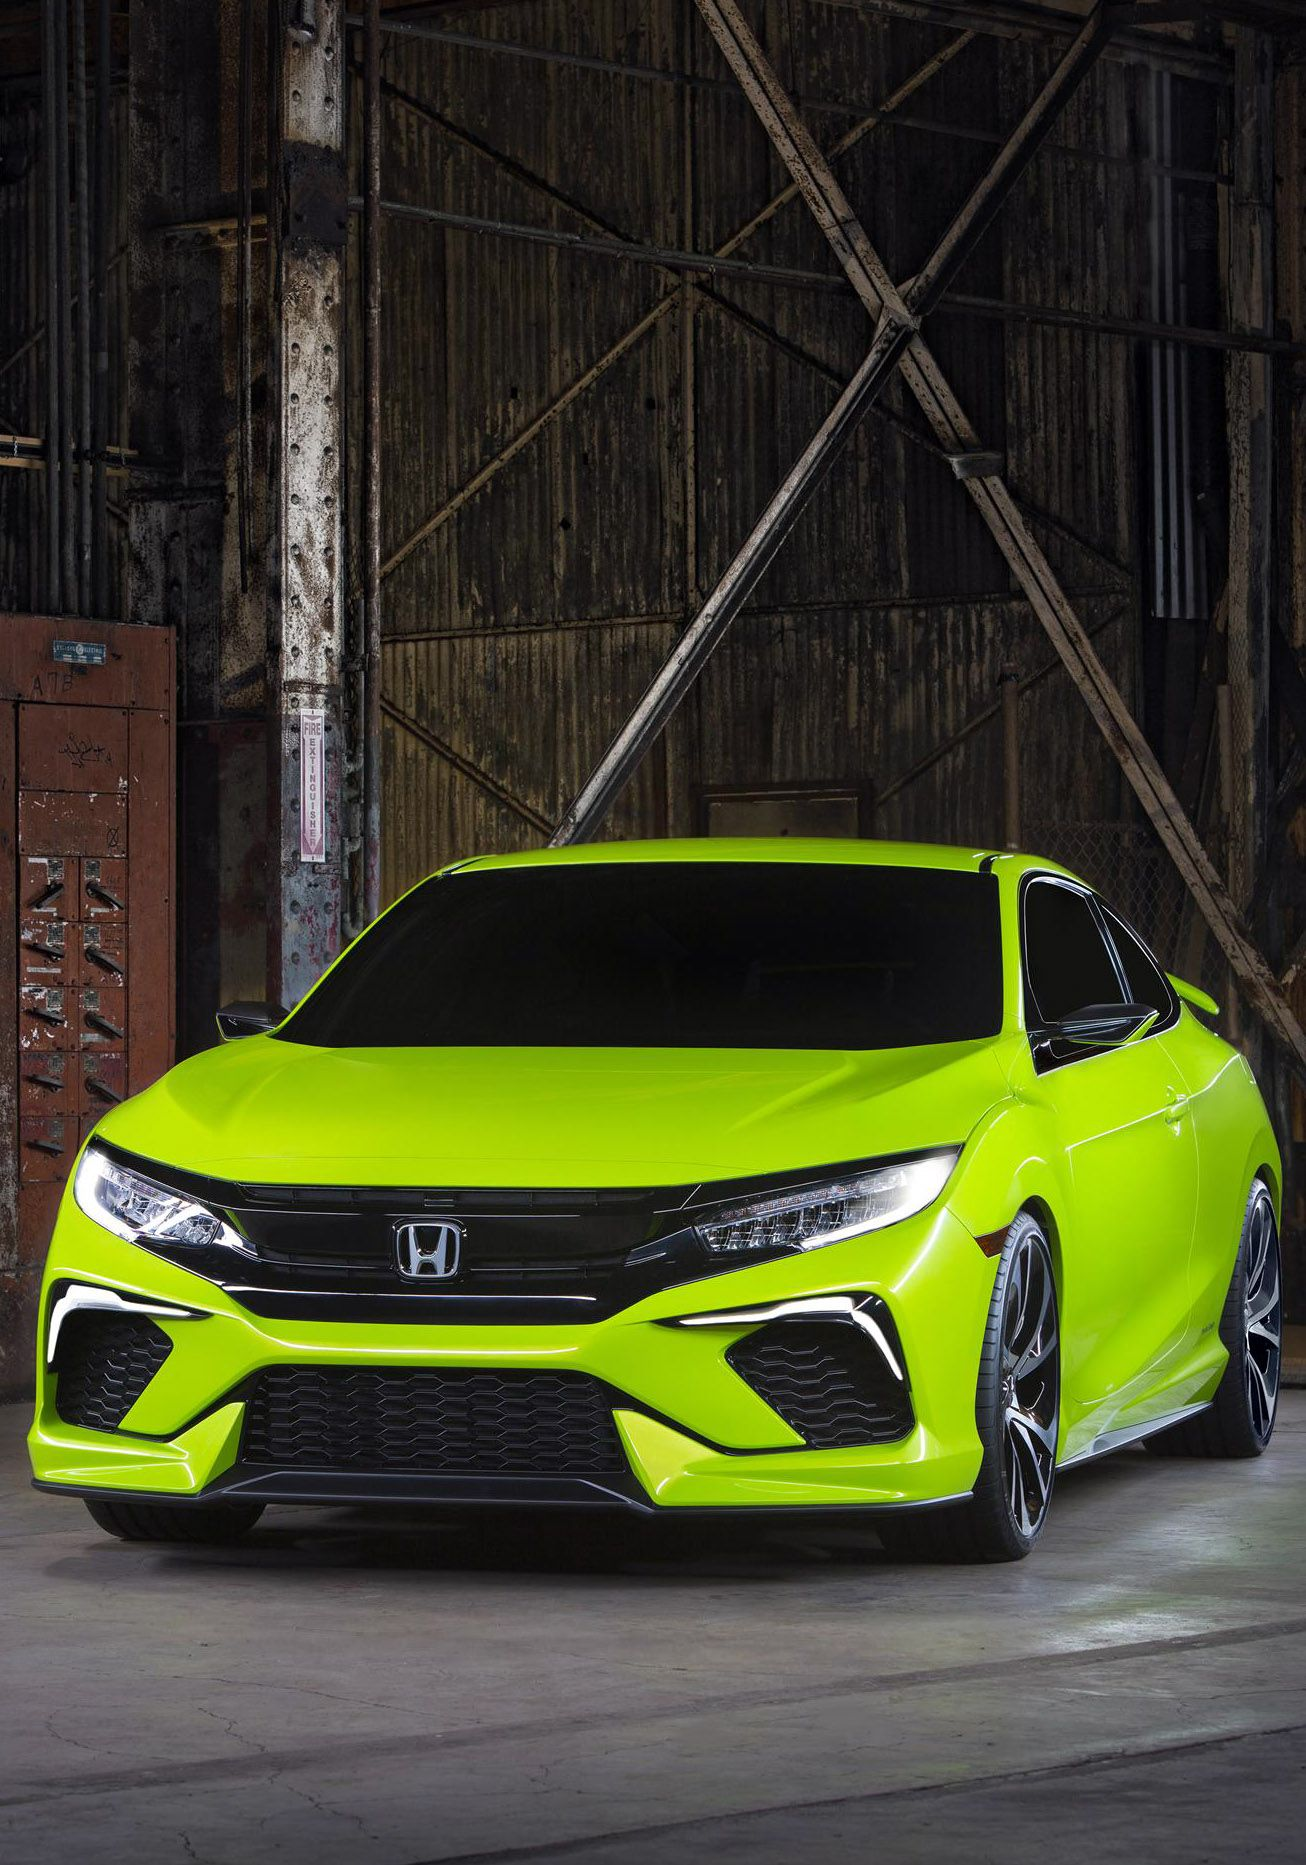 2017 Honda Civic Hatchback Rear Window Tint